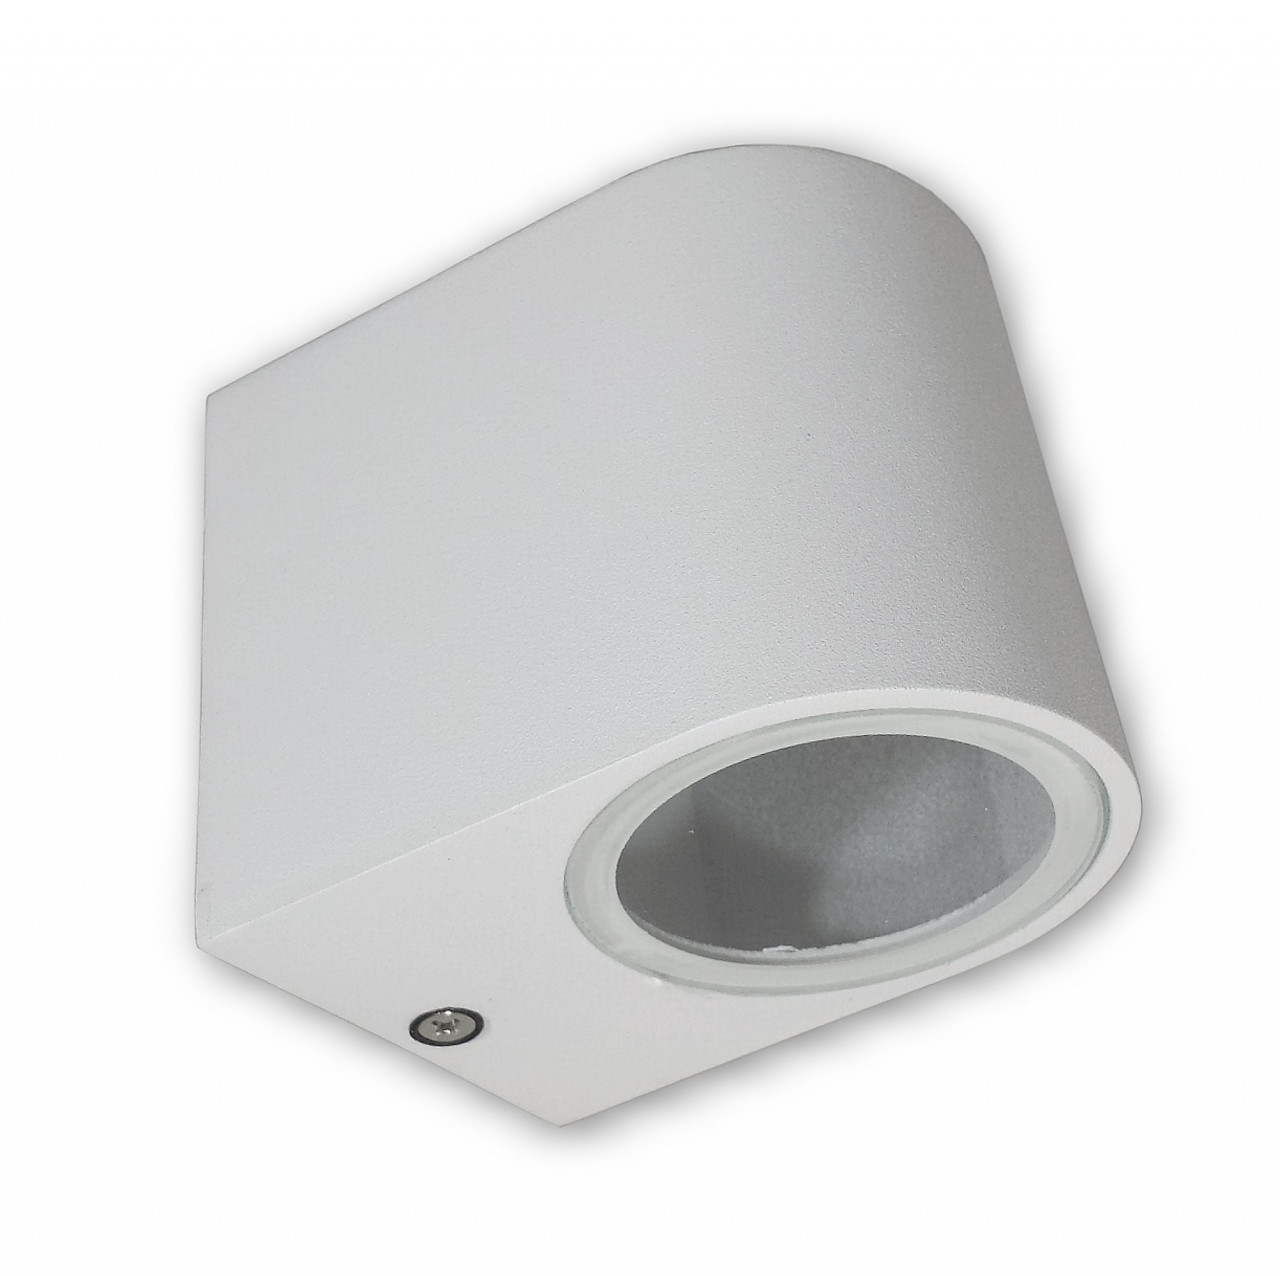 Beleuchtung - Dimmbare Wifi LED Wandlampe (Paris 1 weiss) 5W RGB WW GU10 230V  - Onlineshop Lichtdiscount.de